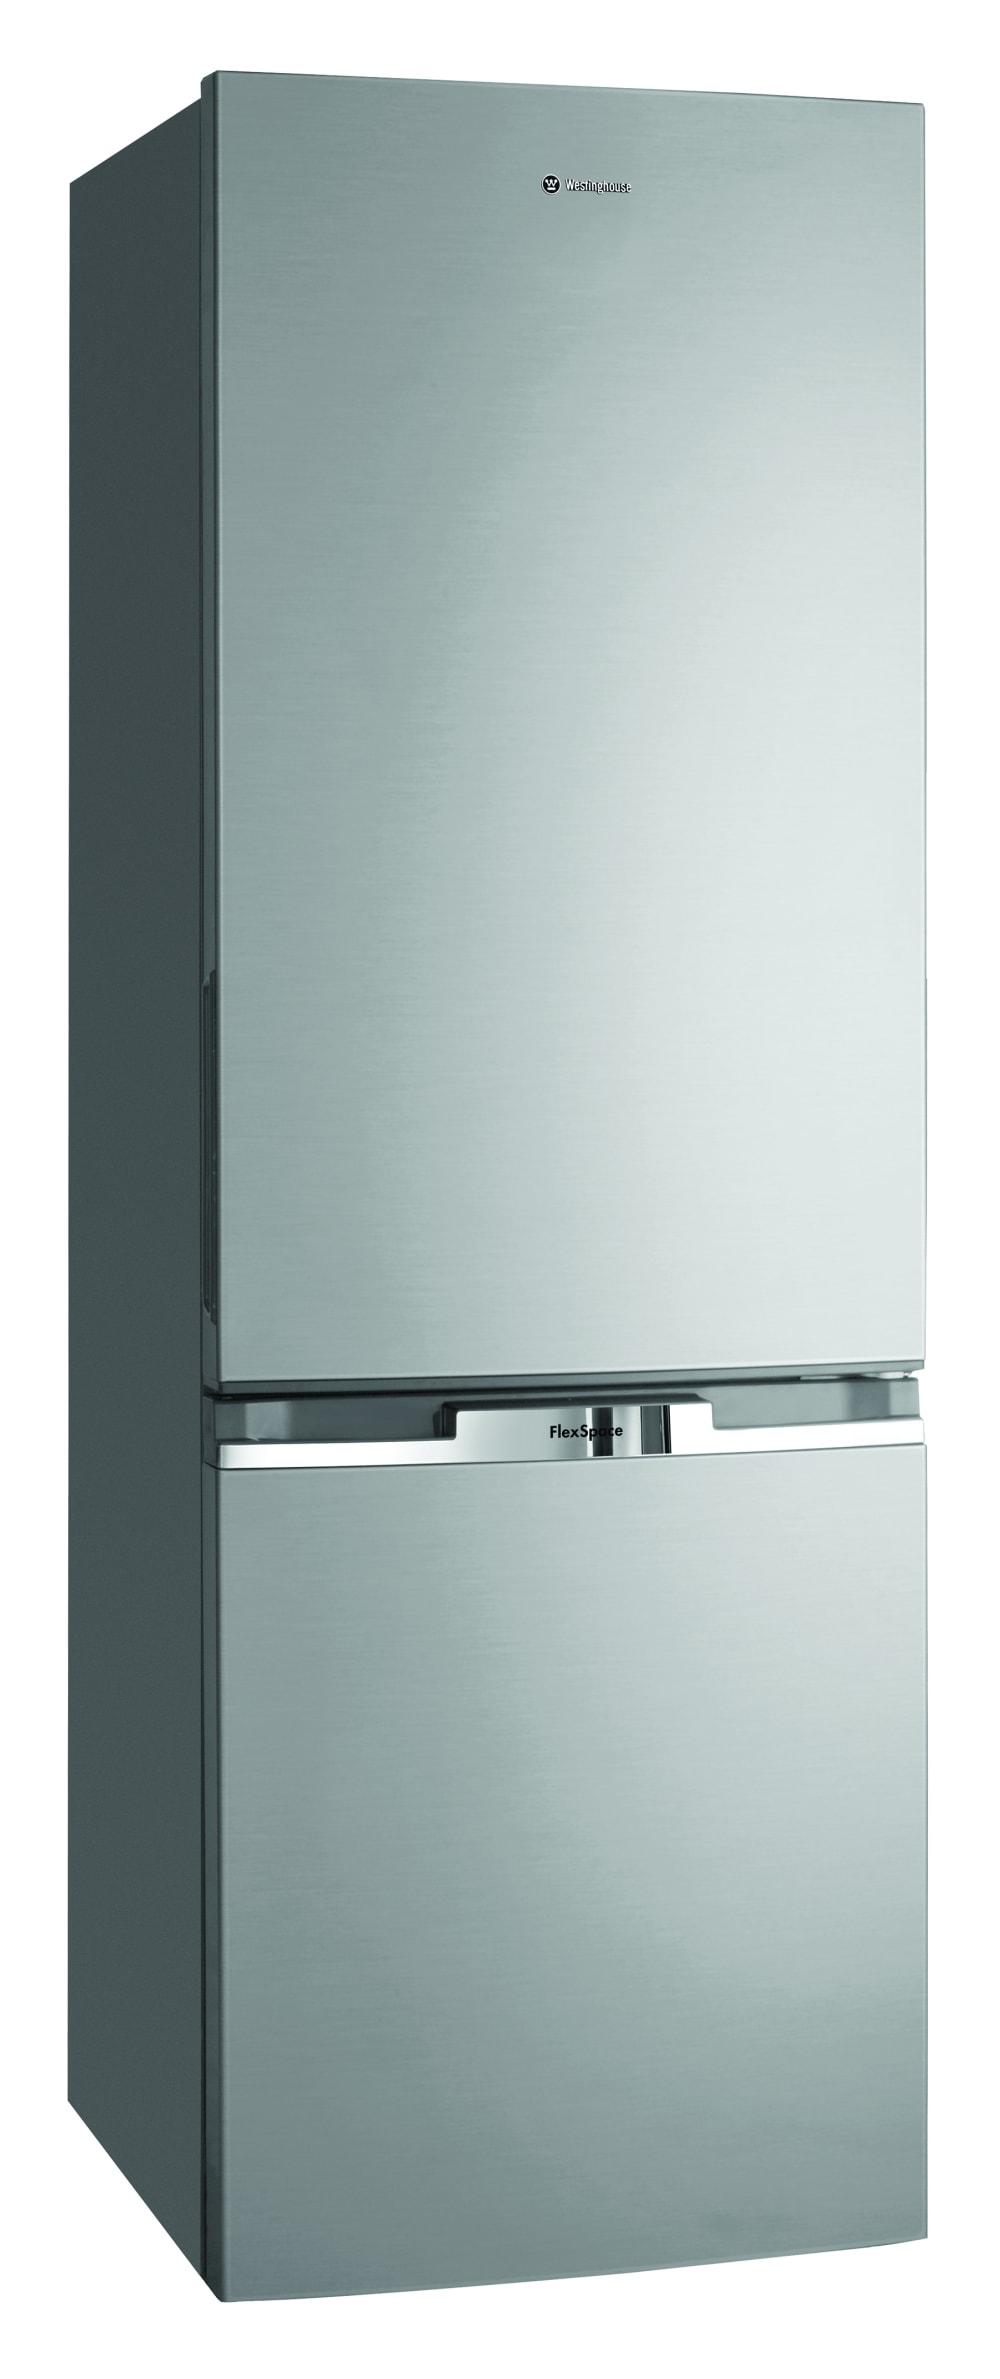 Westinghouse 370L Bottom Mount Refrigerator - Magness Benrow